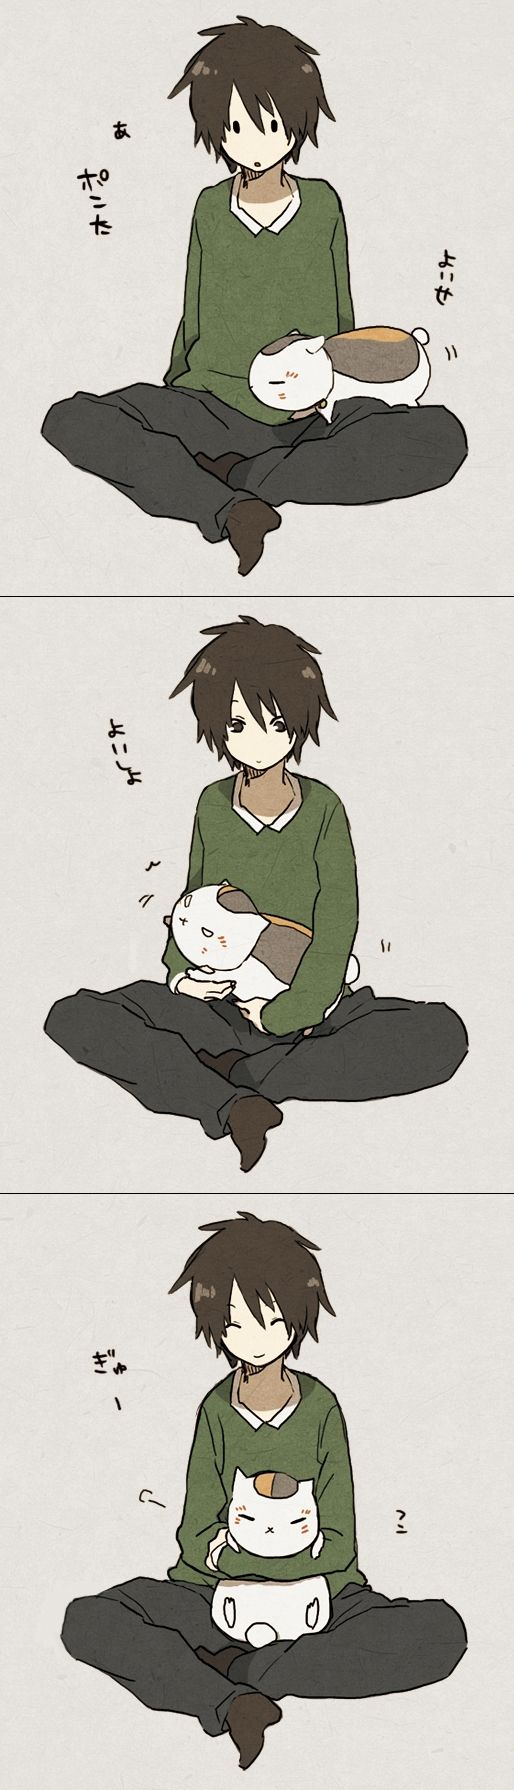 Tags: Anime, Natsume Yuujinchou, Pixiv, Nyanko-sensei, Tanuma Kaname